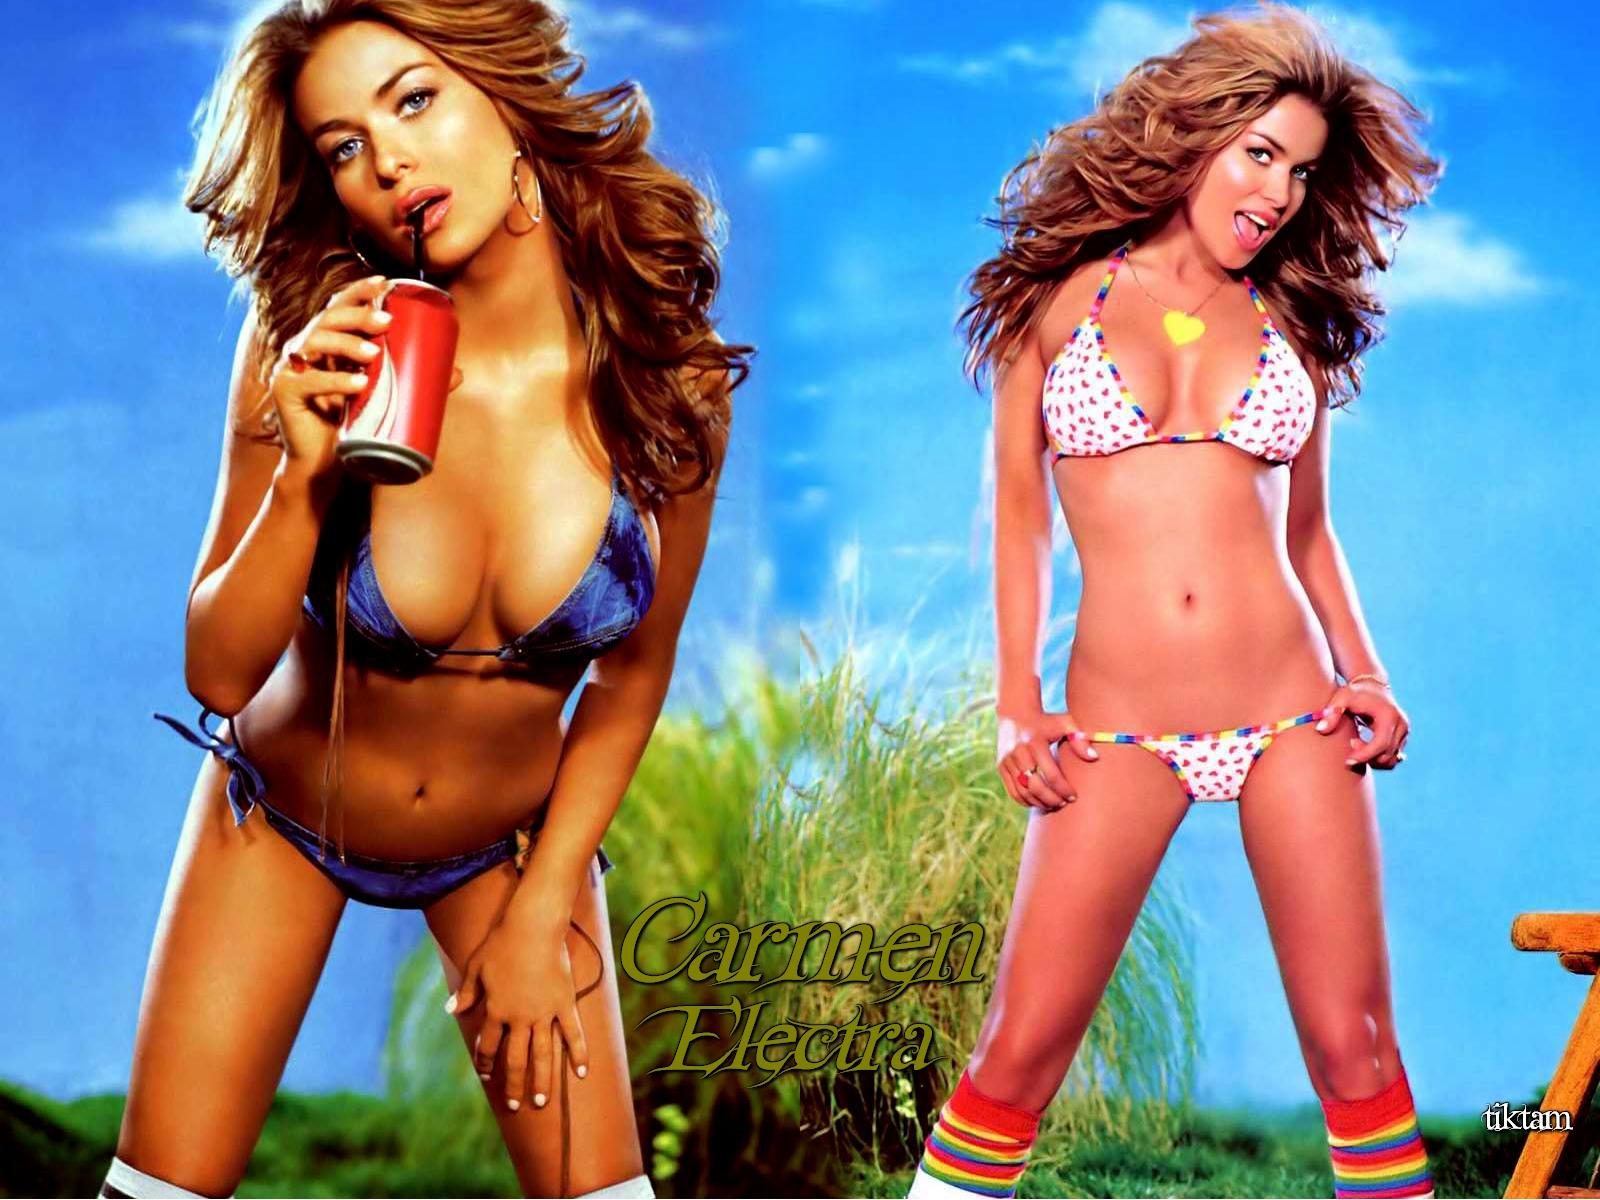 Carmen Electra и Playboy порно,секс,эротика,еротика,ххх,xxx,carmen